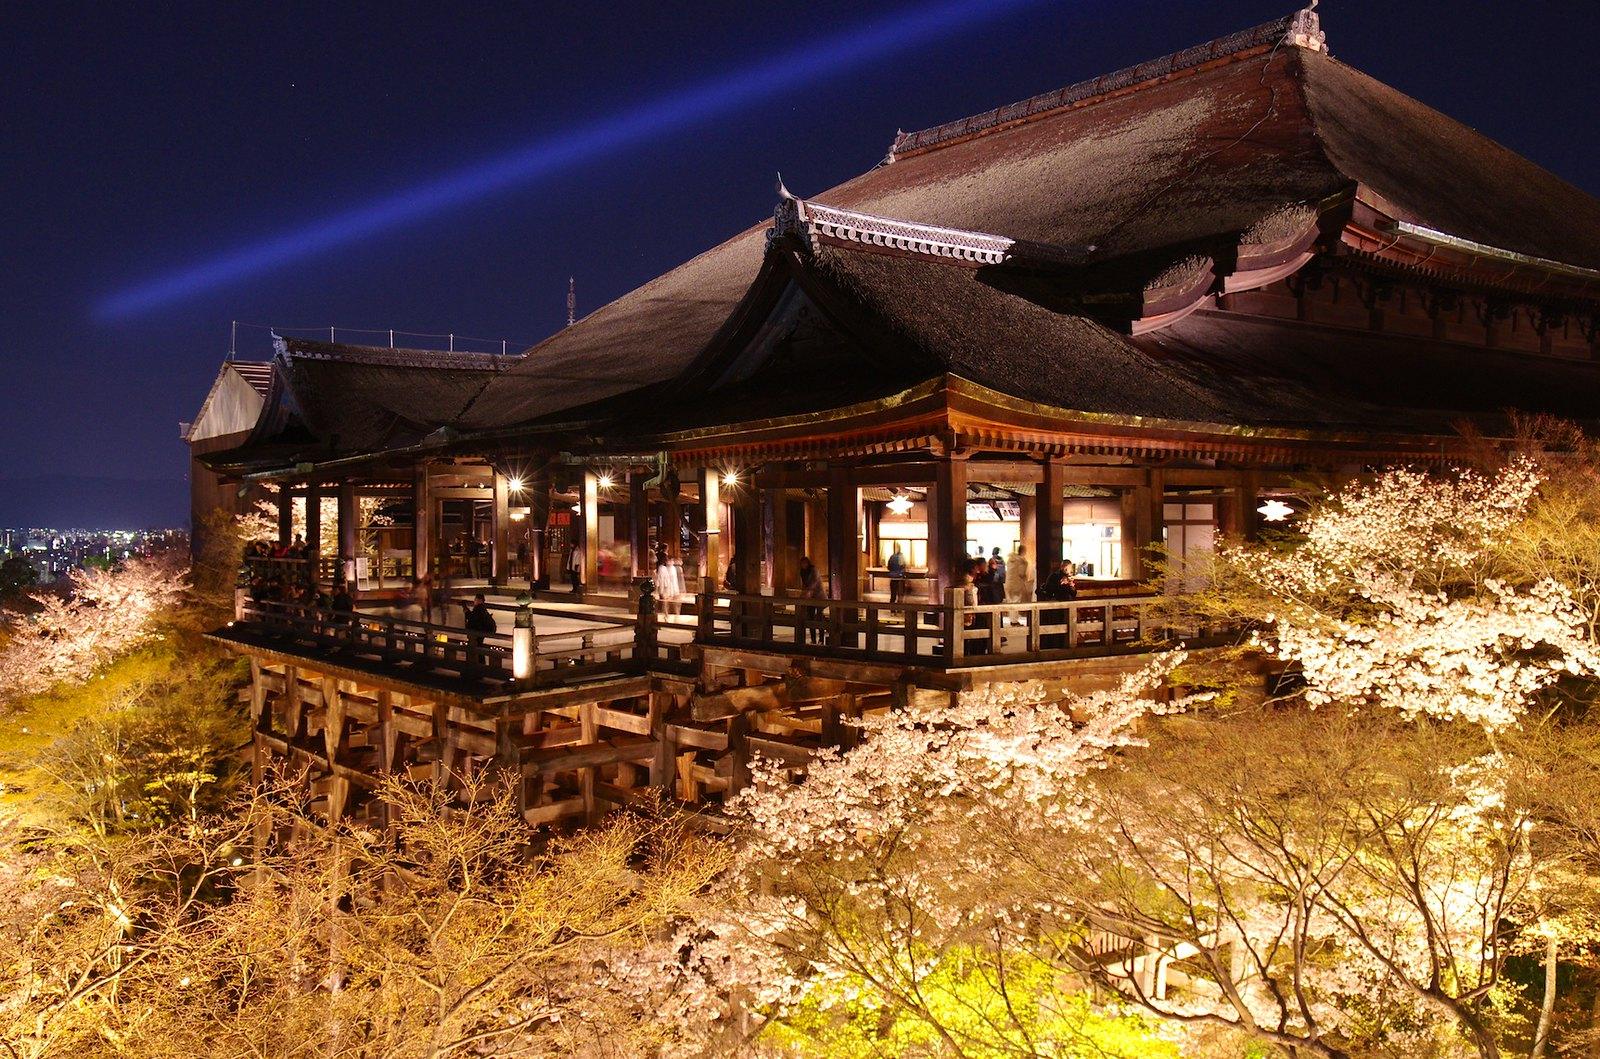 清水寺 夜の特別拝観 2014春  Kiyomizu Temple